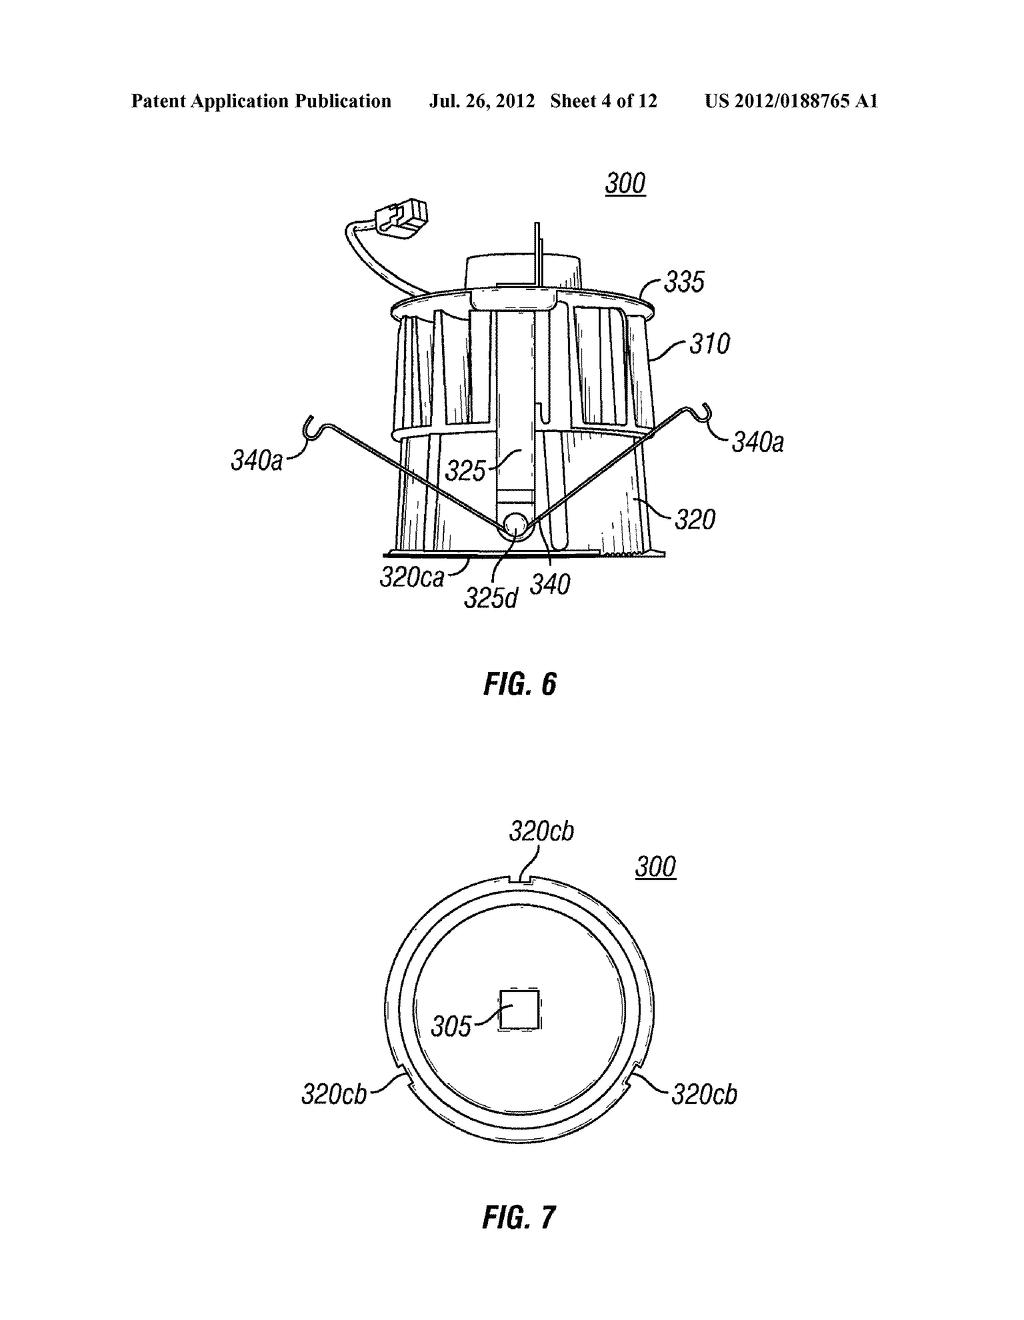 light emitting diode recessed light fixture diagram schematic rh patentsencyclopedia com Recessed Kitchen Lighting Product Recessed Lighting Design